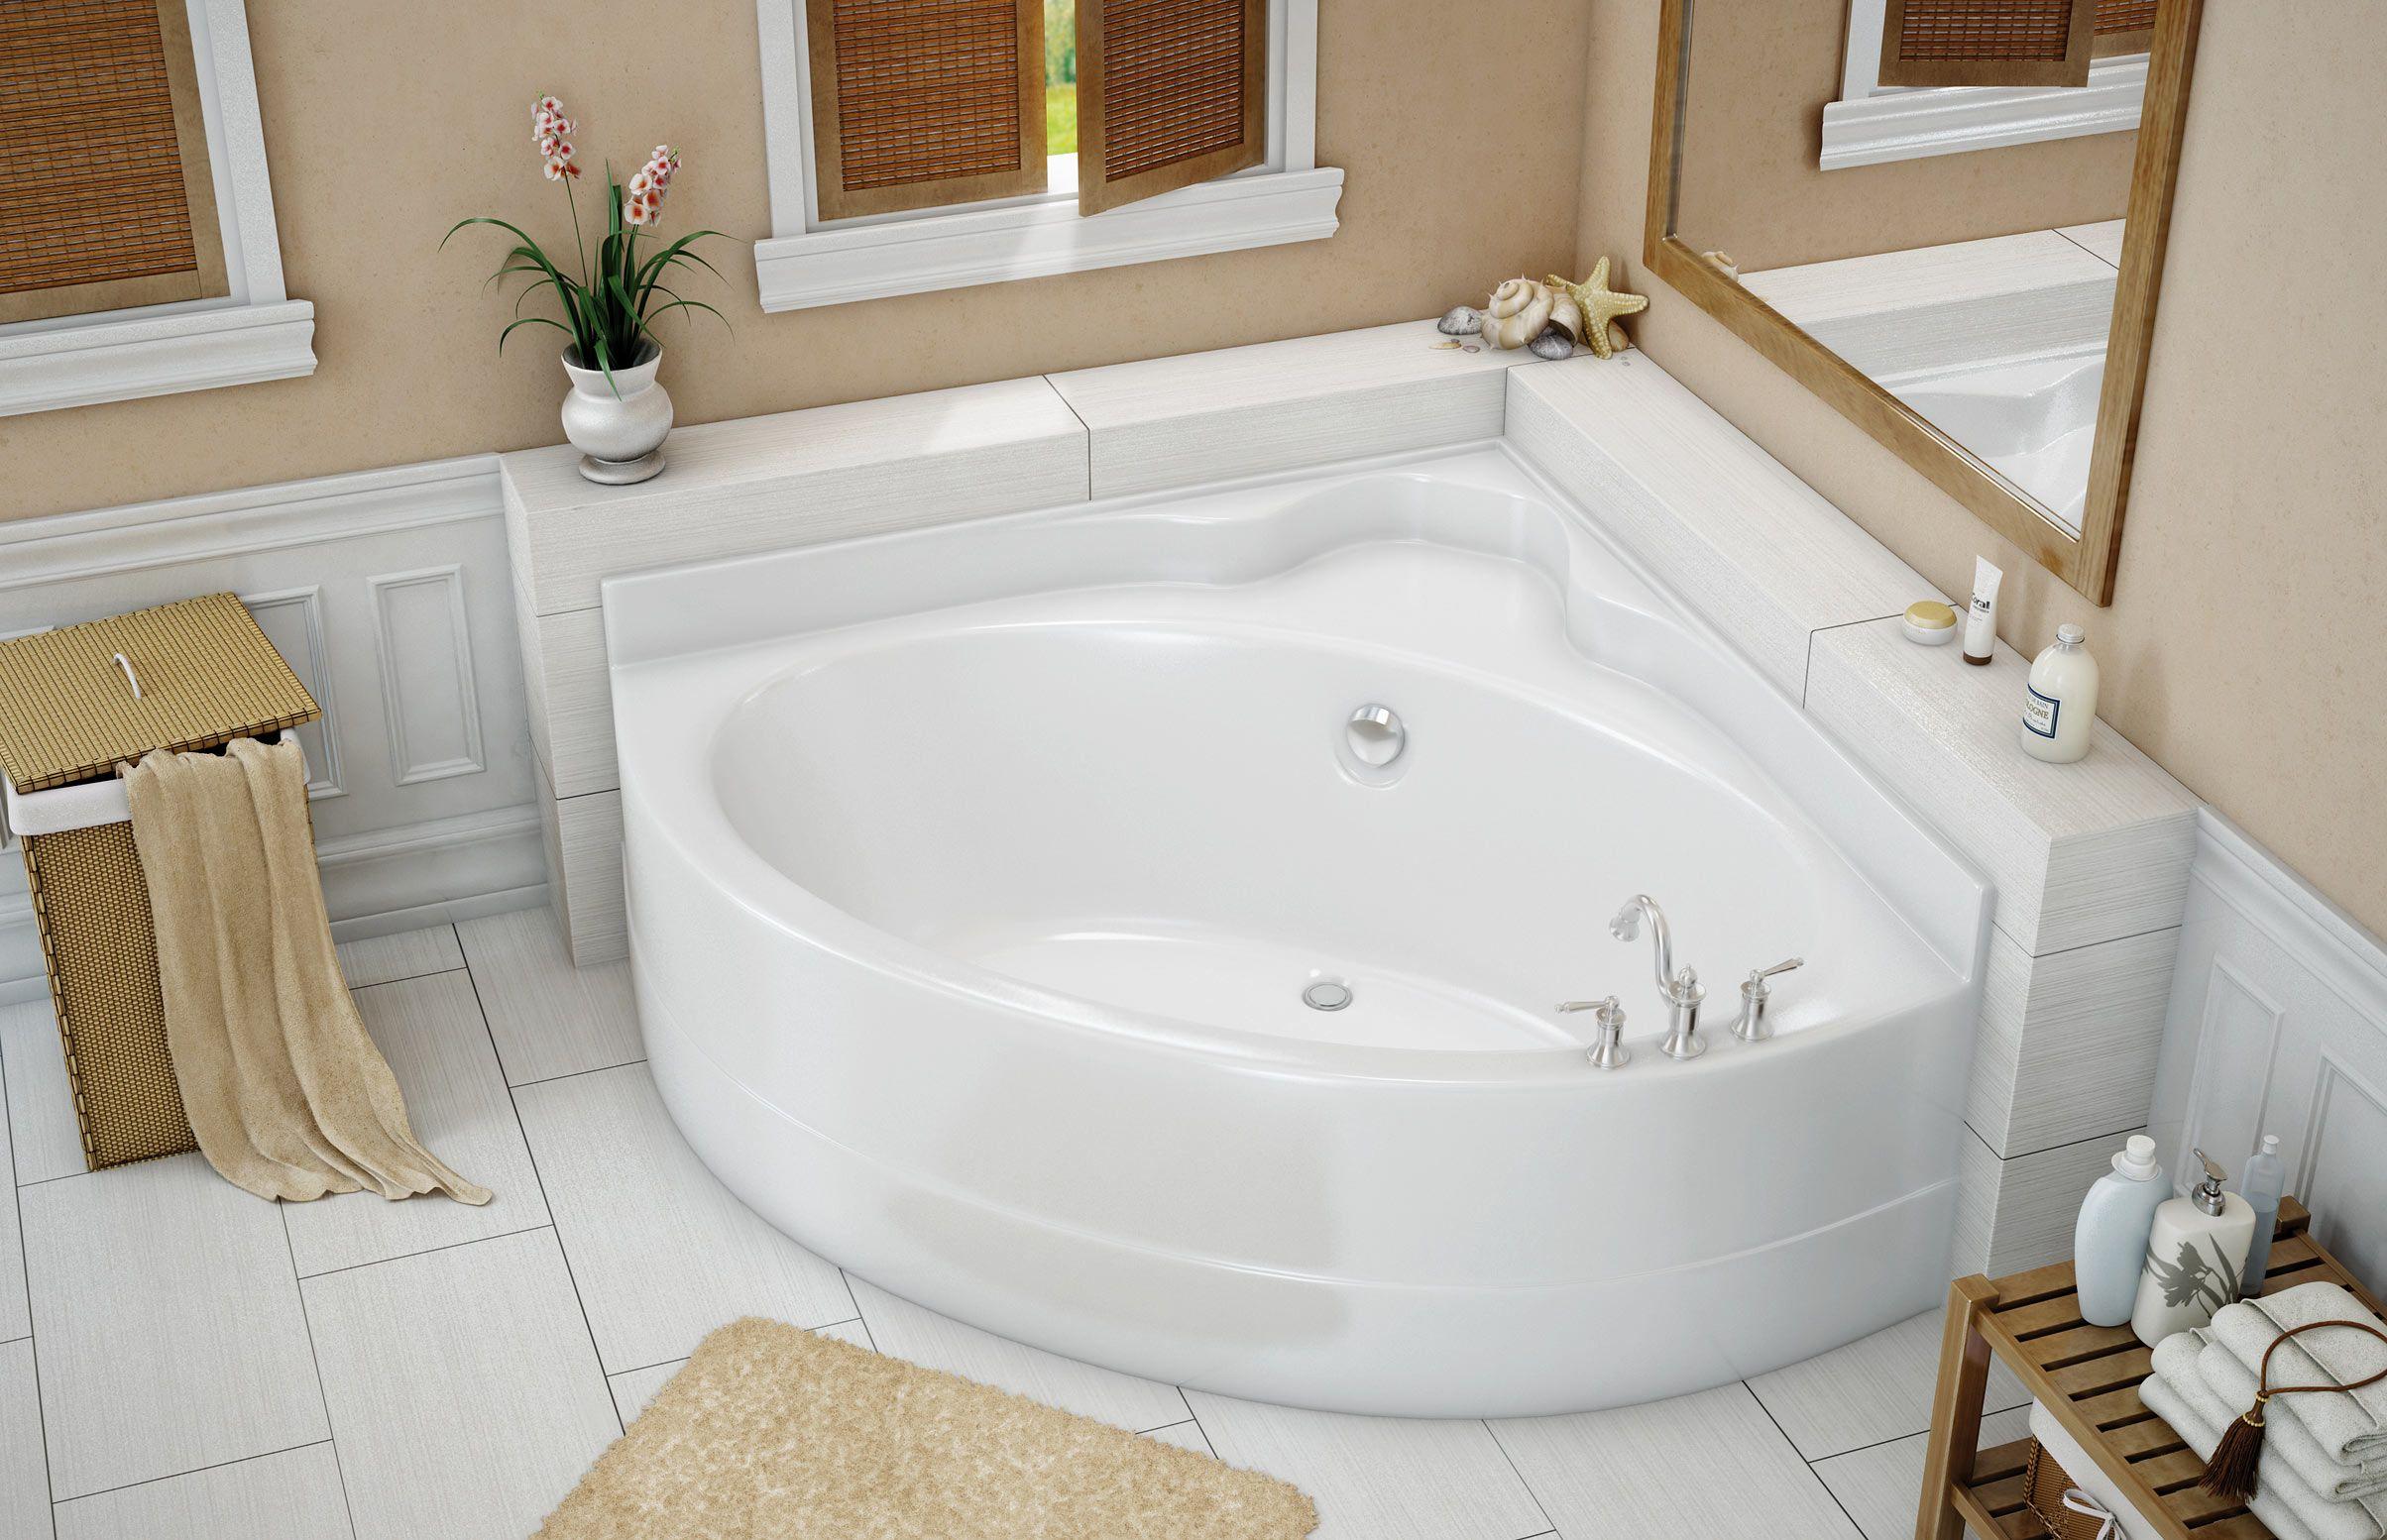 Bain VO5050 5 PI en coin - MAAX Professionnel | Salle de bain ...